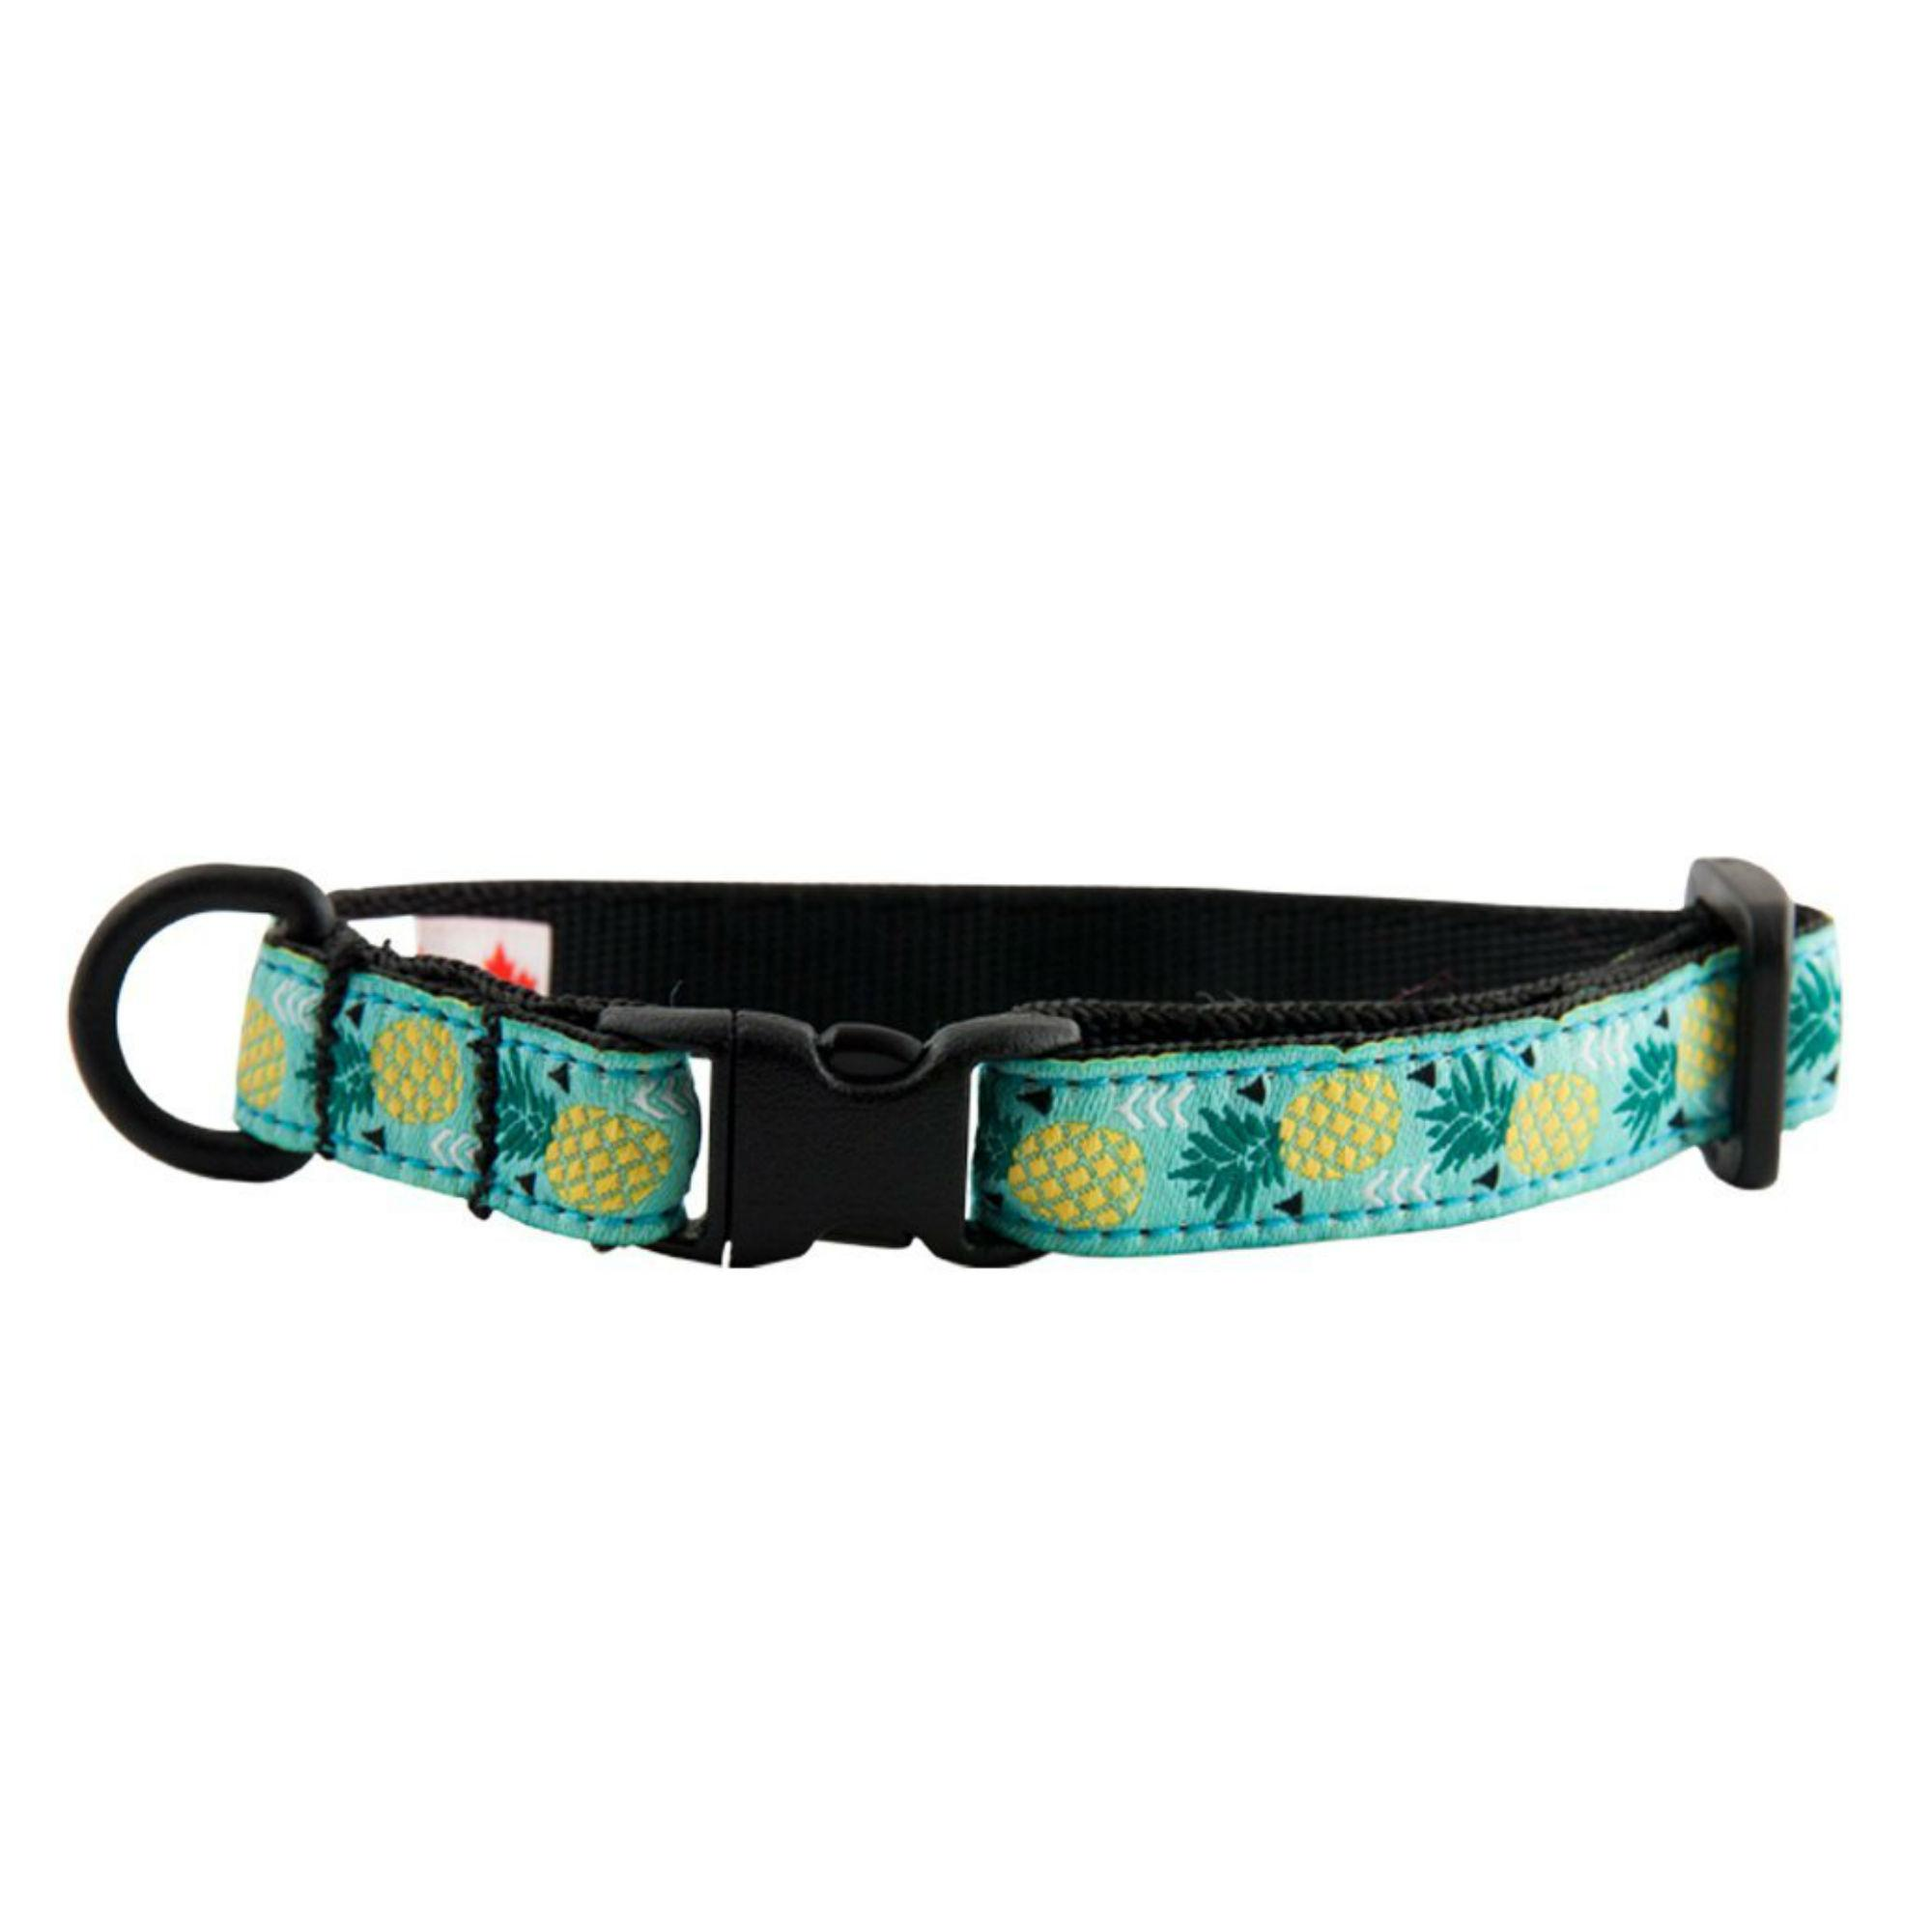 Kitty Breakaway Cat Collar - Pineapple Parade